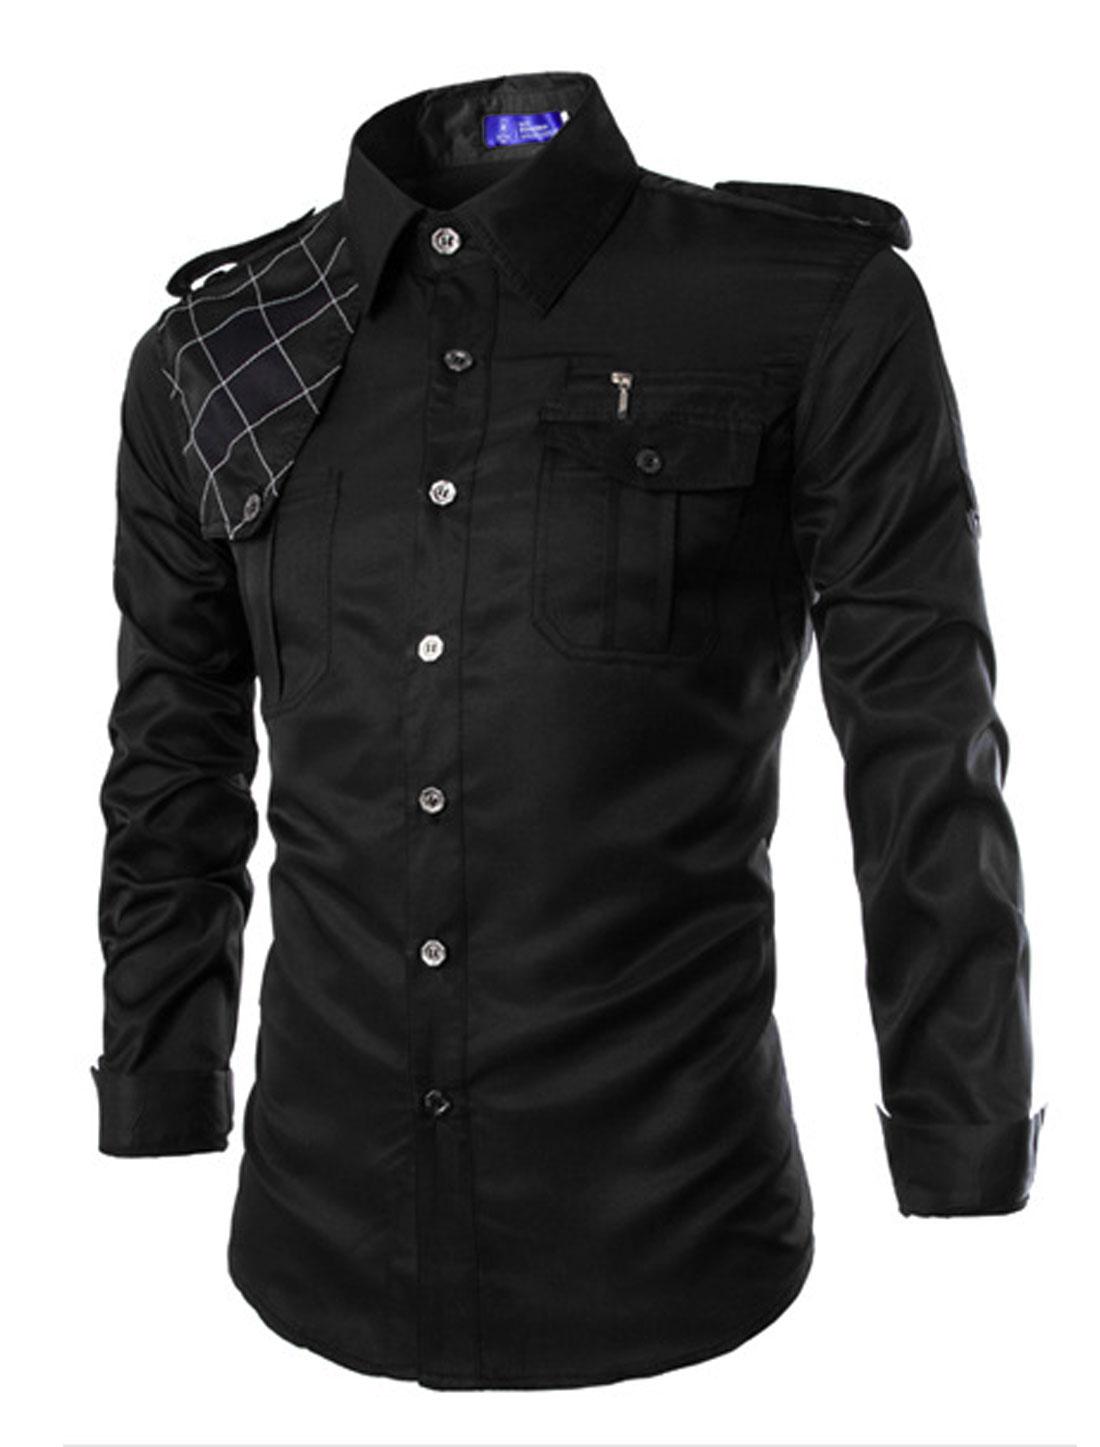 Man Point Collar Long Sleeves Button-tab Epaulets Casual Shirts Black M